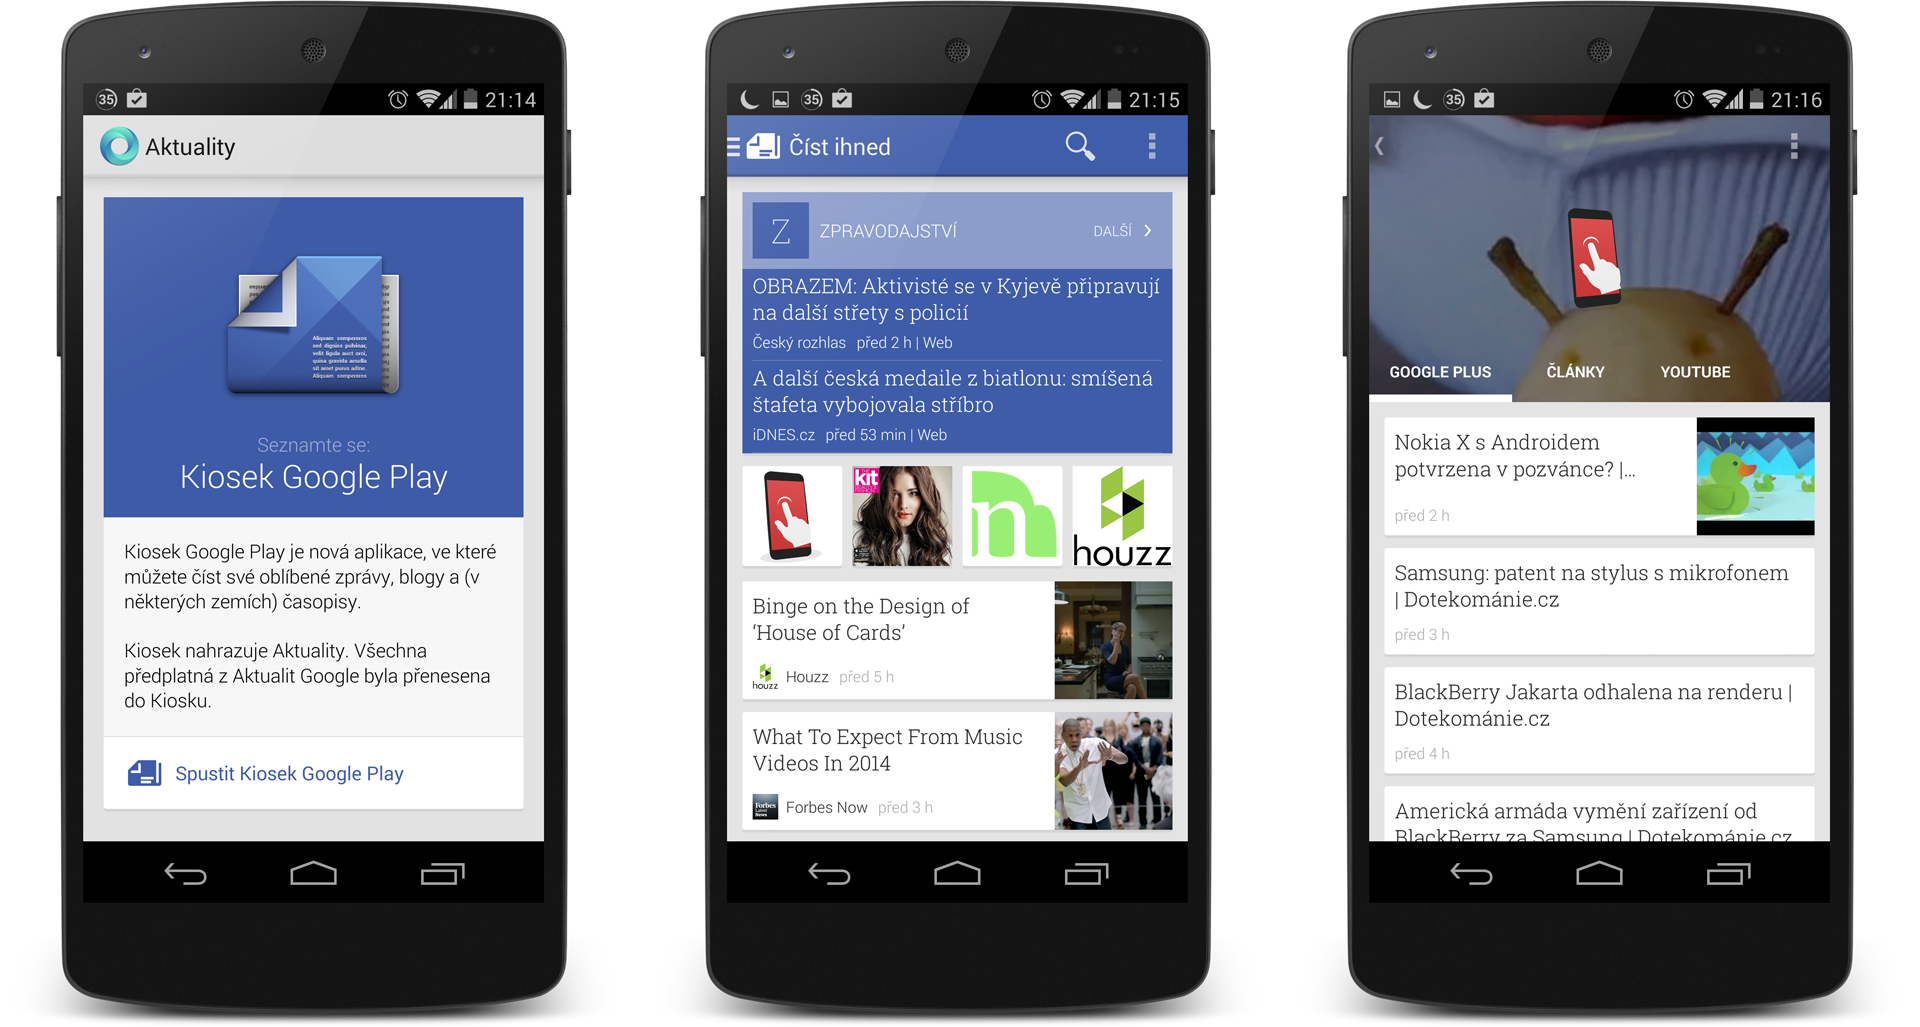 Kiosek Google Play má skryté nastavení pro designéry